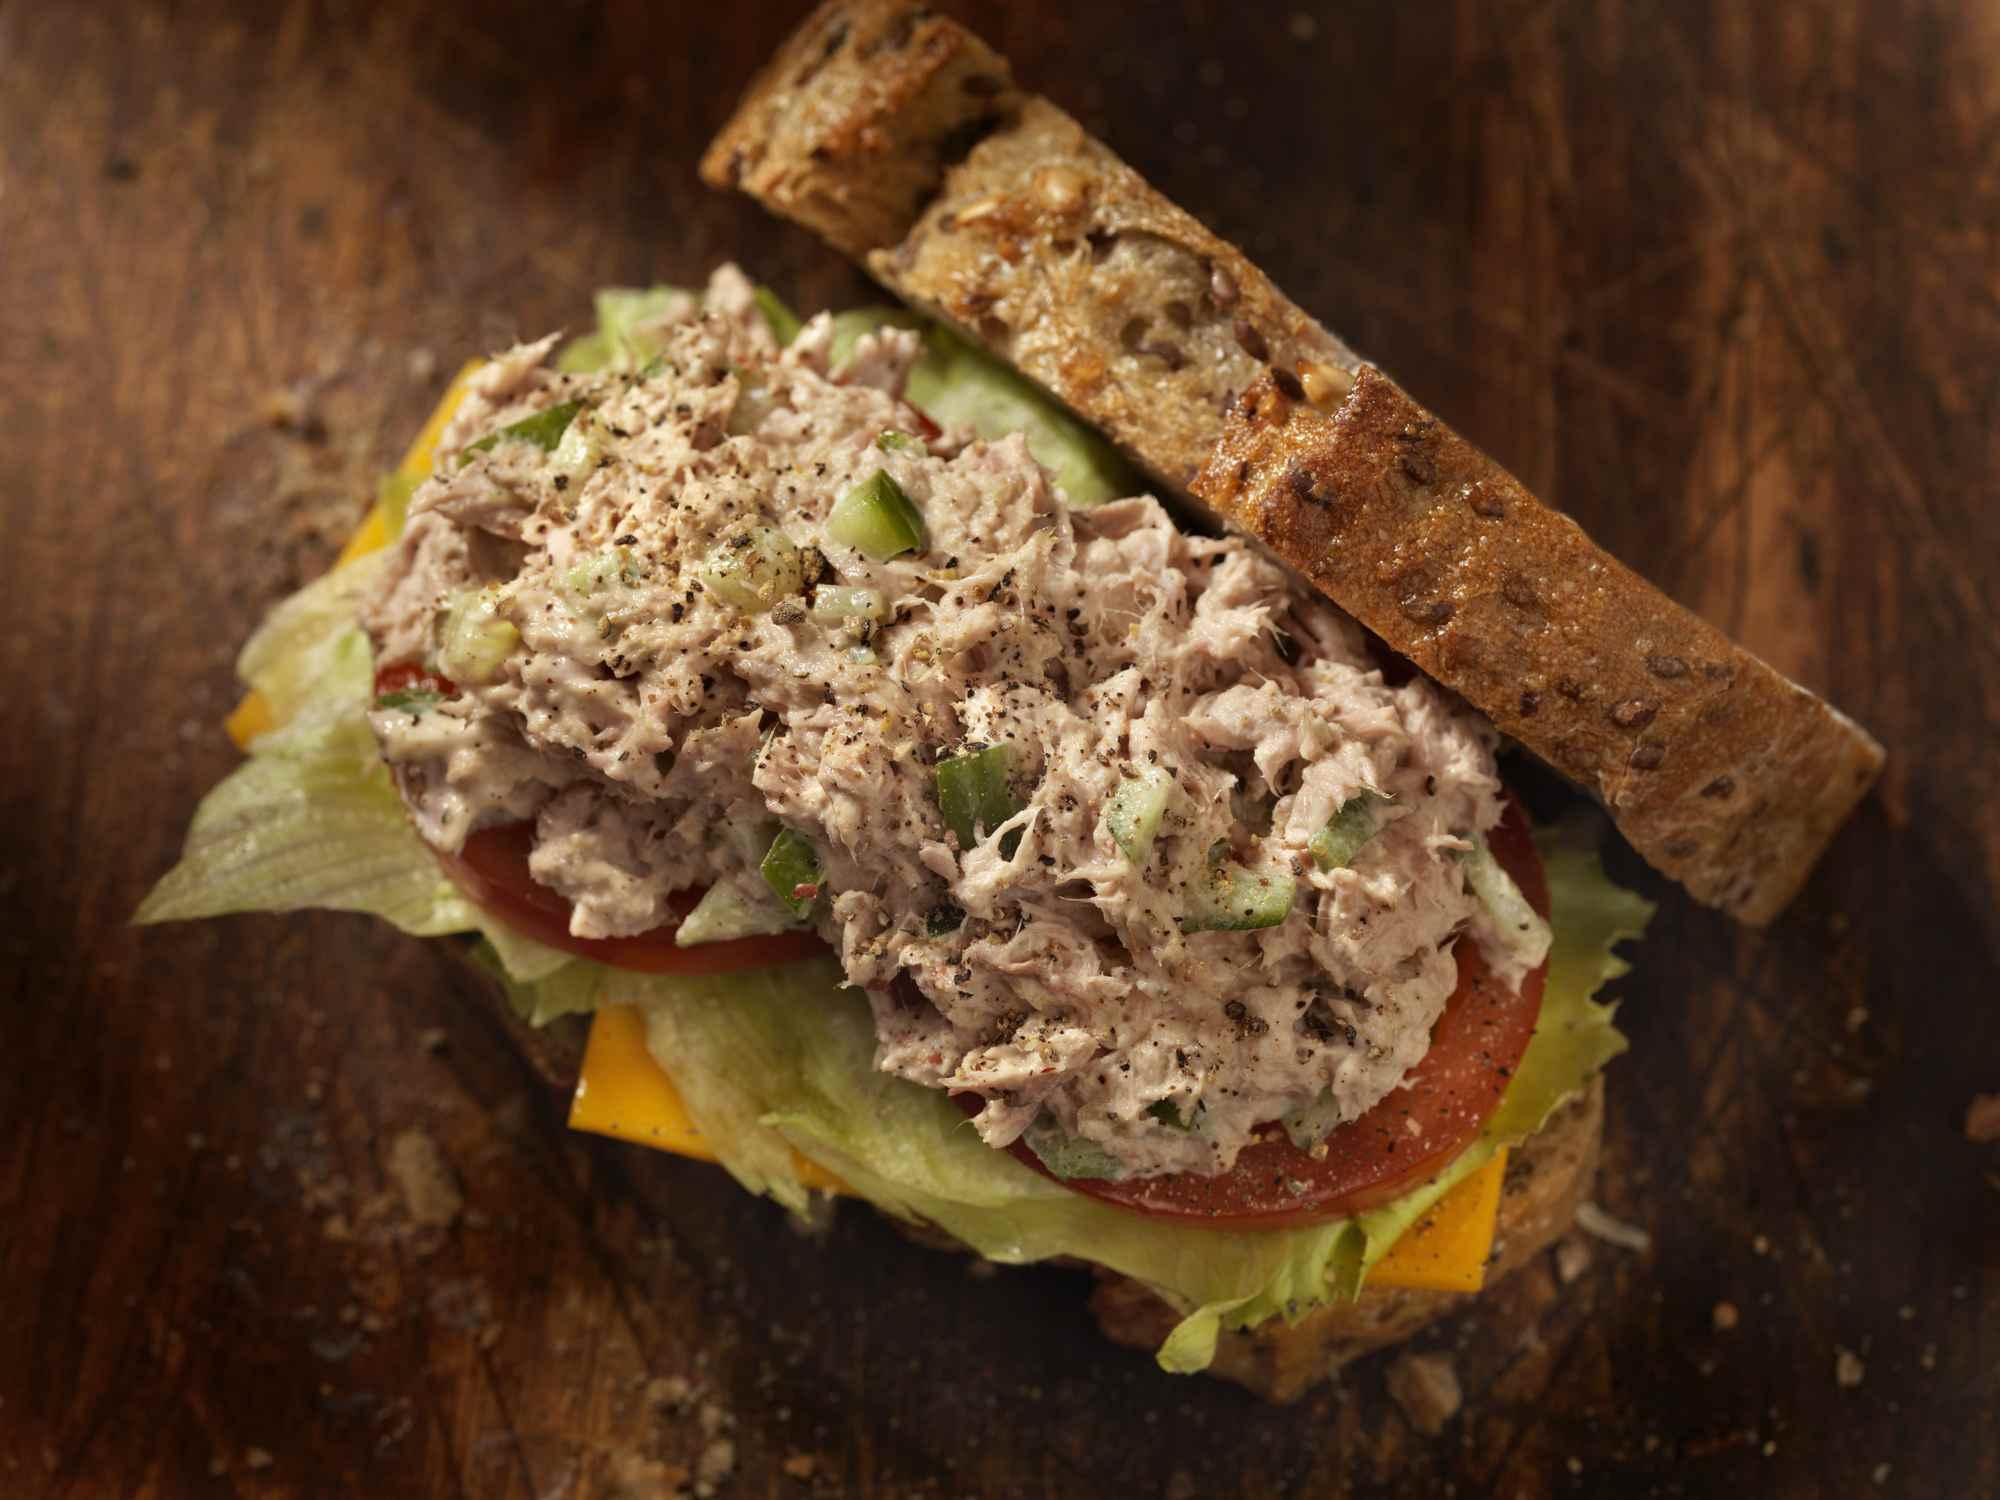 Tuna salad sandwich on wooden table